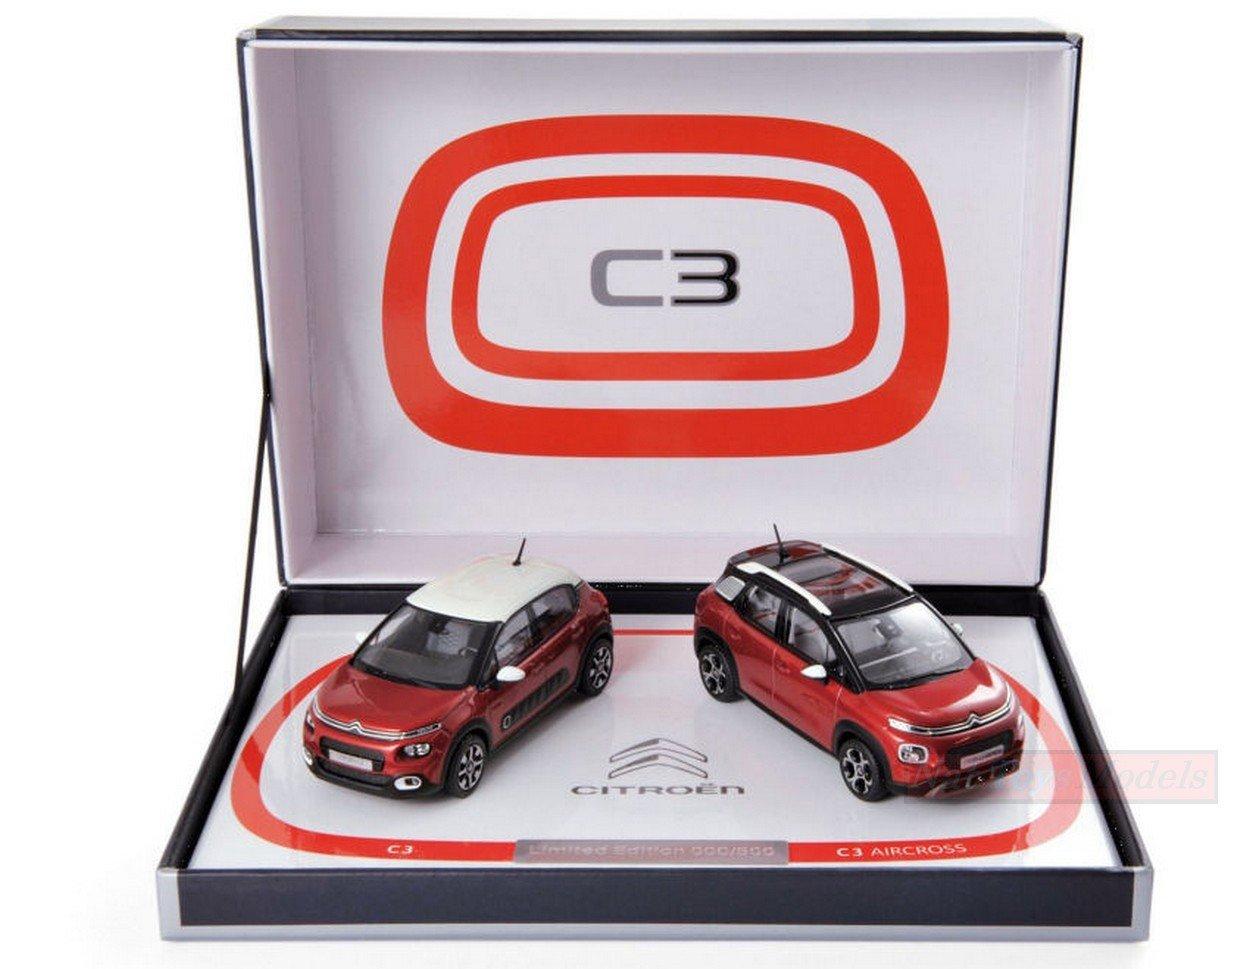 NOREV NV155329 COFFRET Citroen C3  C3 AIRCROSS 2017 Limited (2 Cars) 1:43 Model